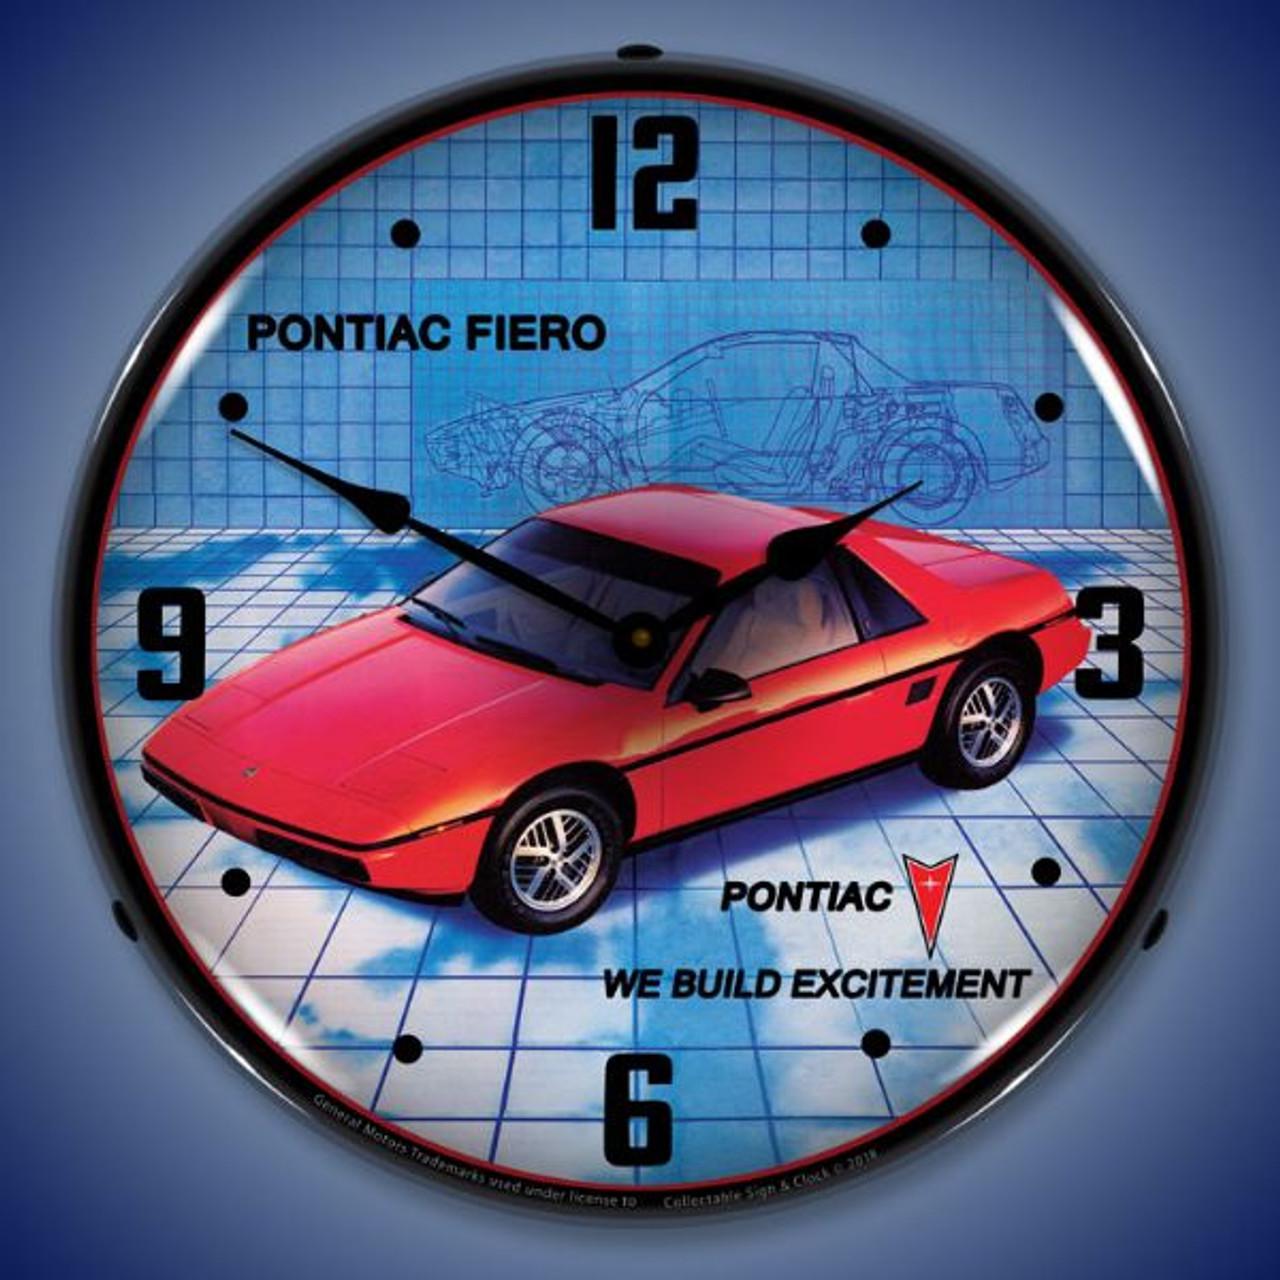 1984 Pontiac Fiero Lighted Wall Clock 14 x 14 Inches